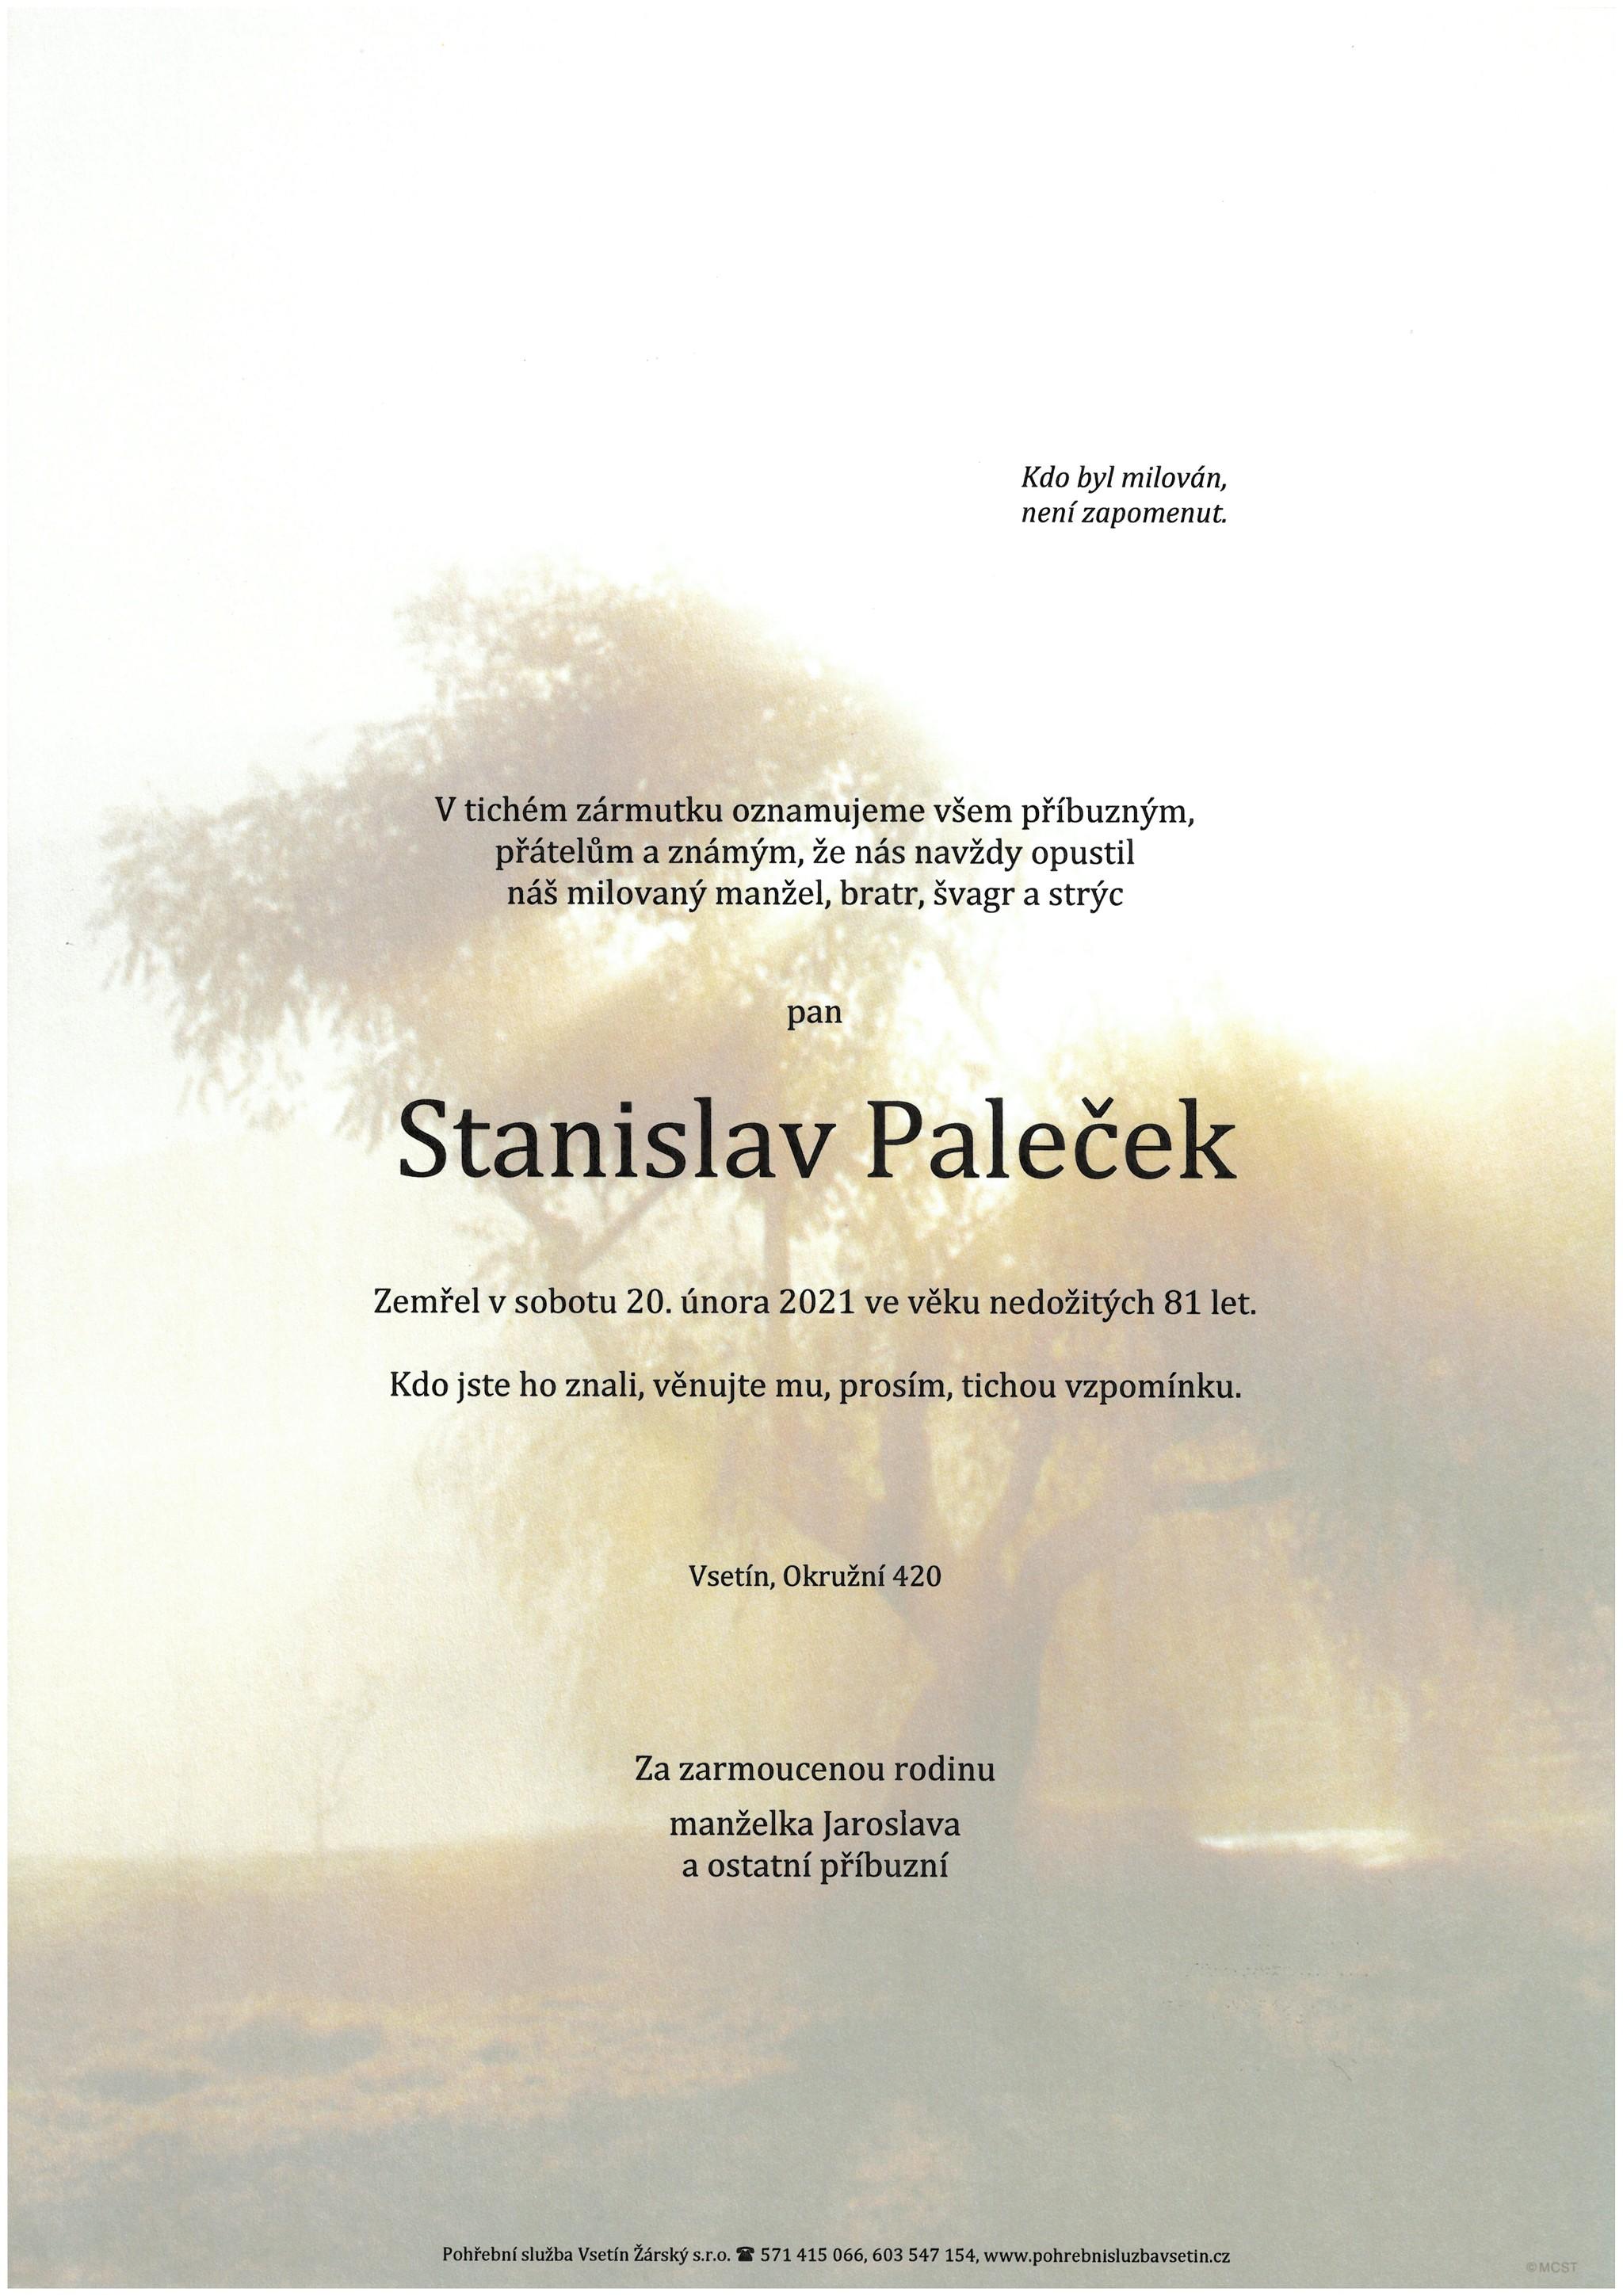 Stanislav Paleček